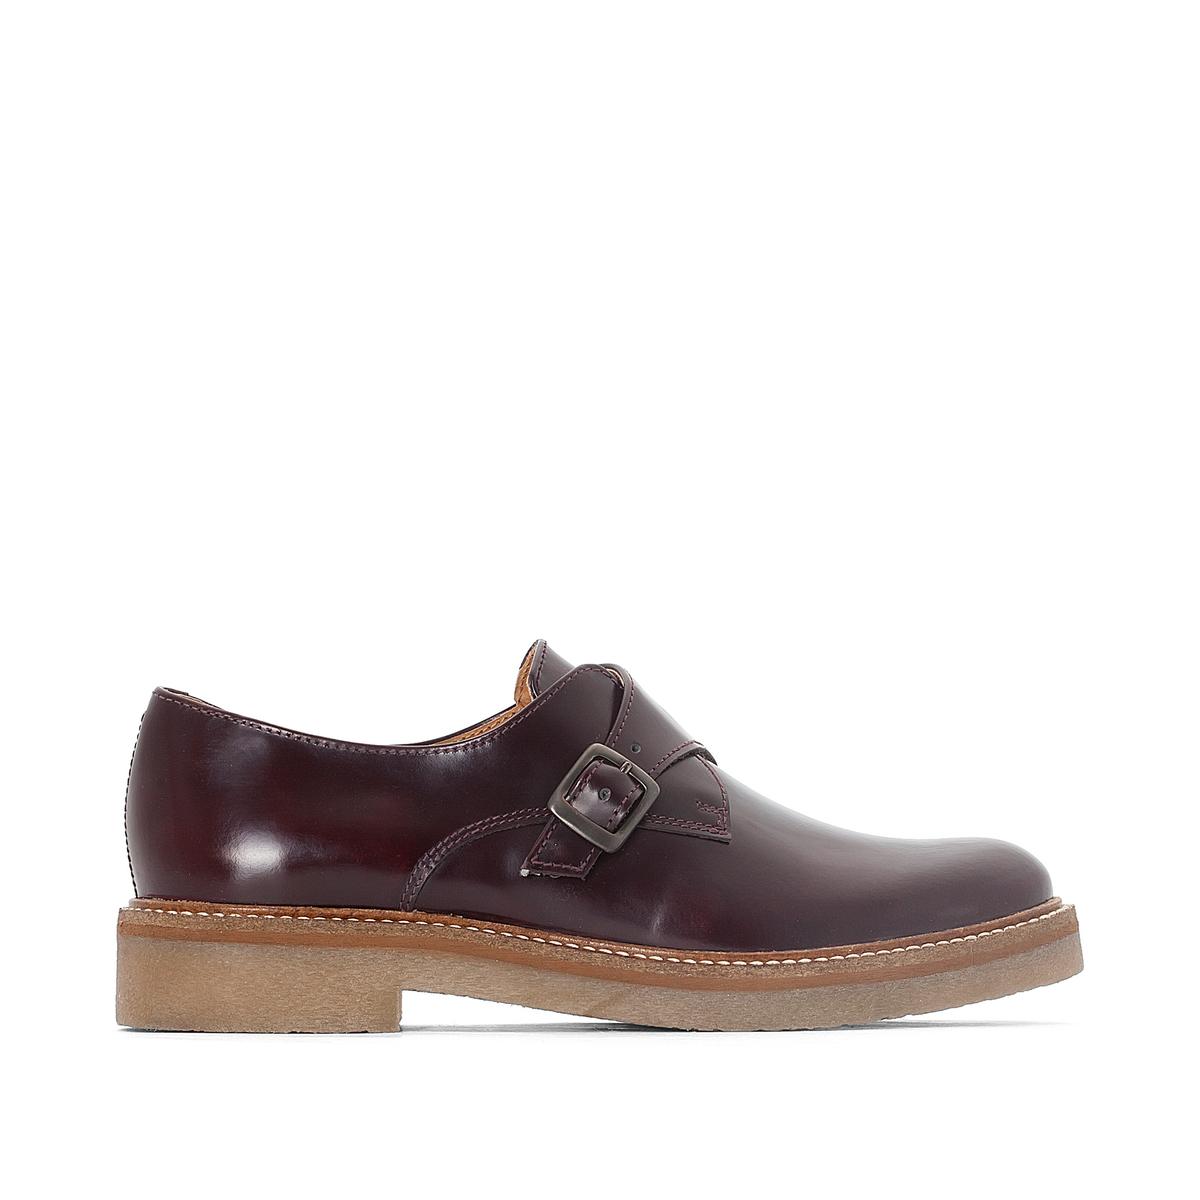 Ботинки-дерби OXFORM ботинки дерби